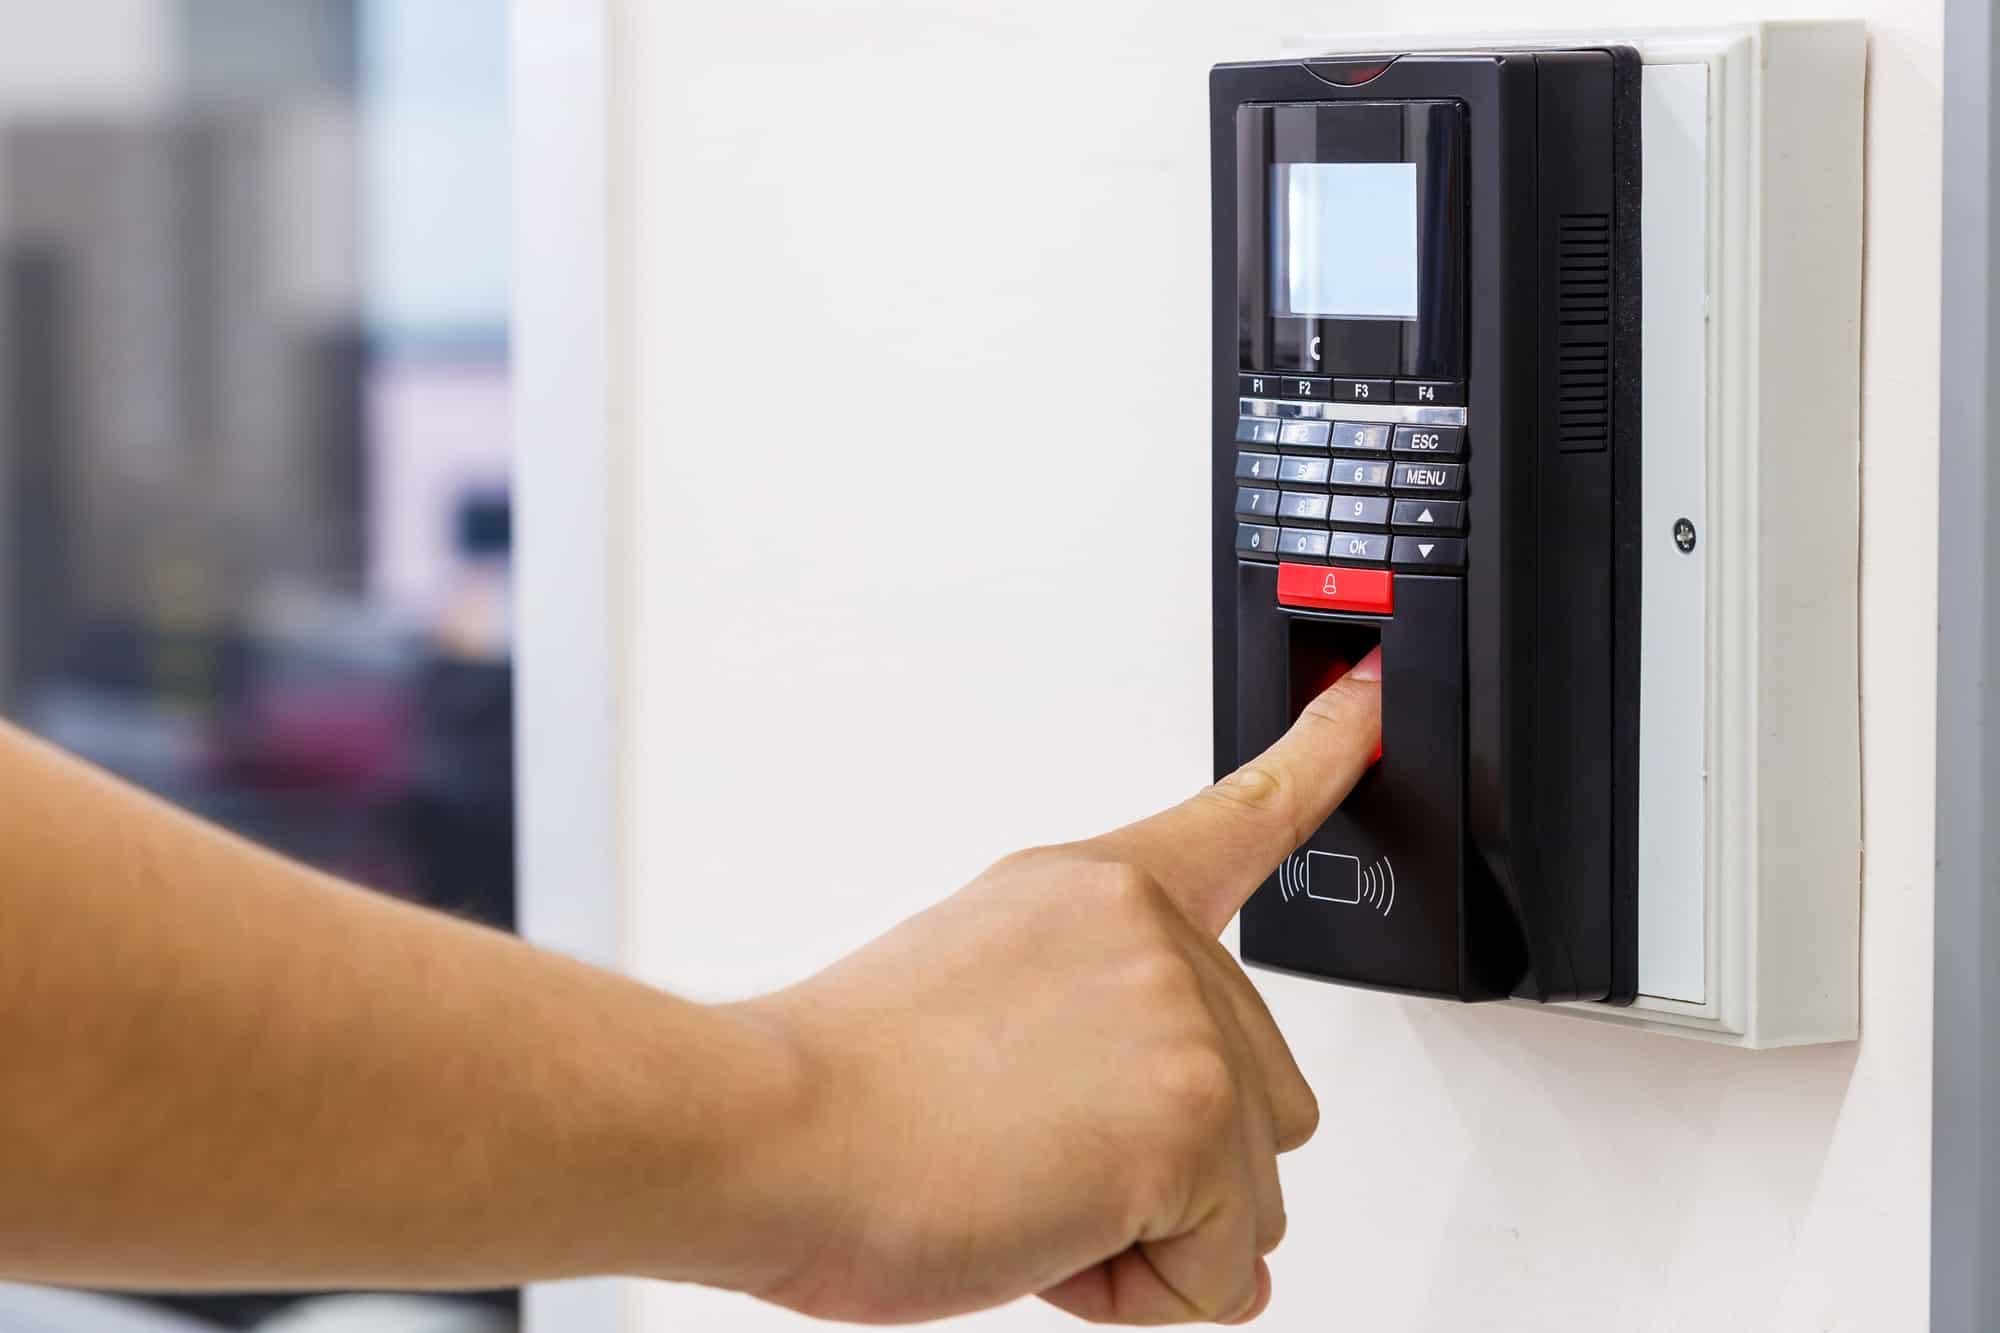 Finger scan biometric time clock